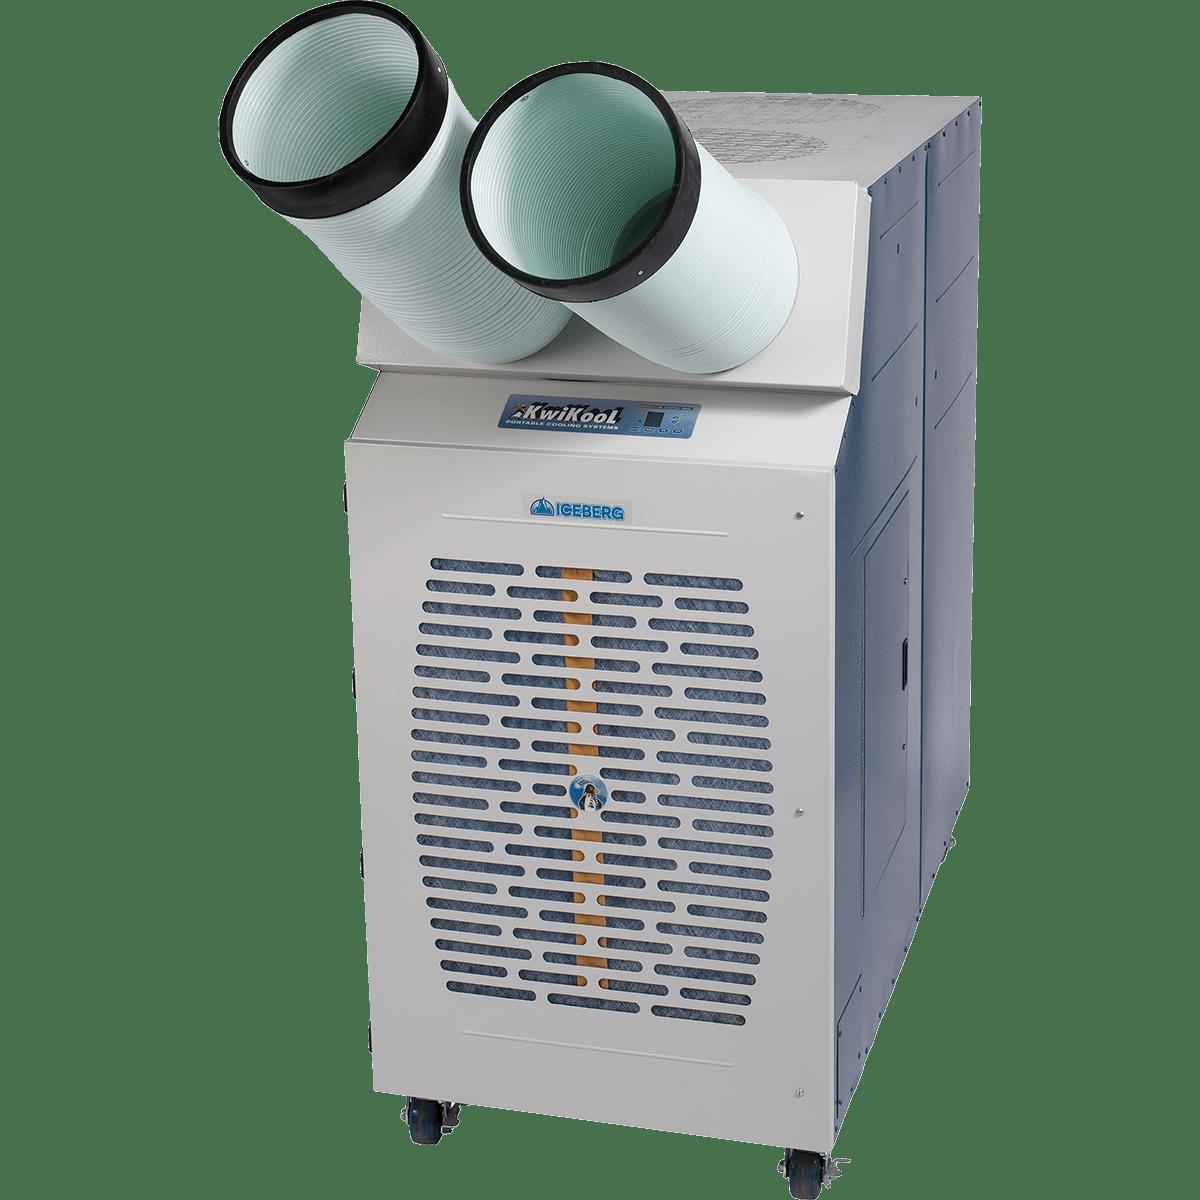 KwiKool 120,000 BTU 10-Ton Portable Air Conditioners | Sylvane